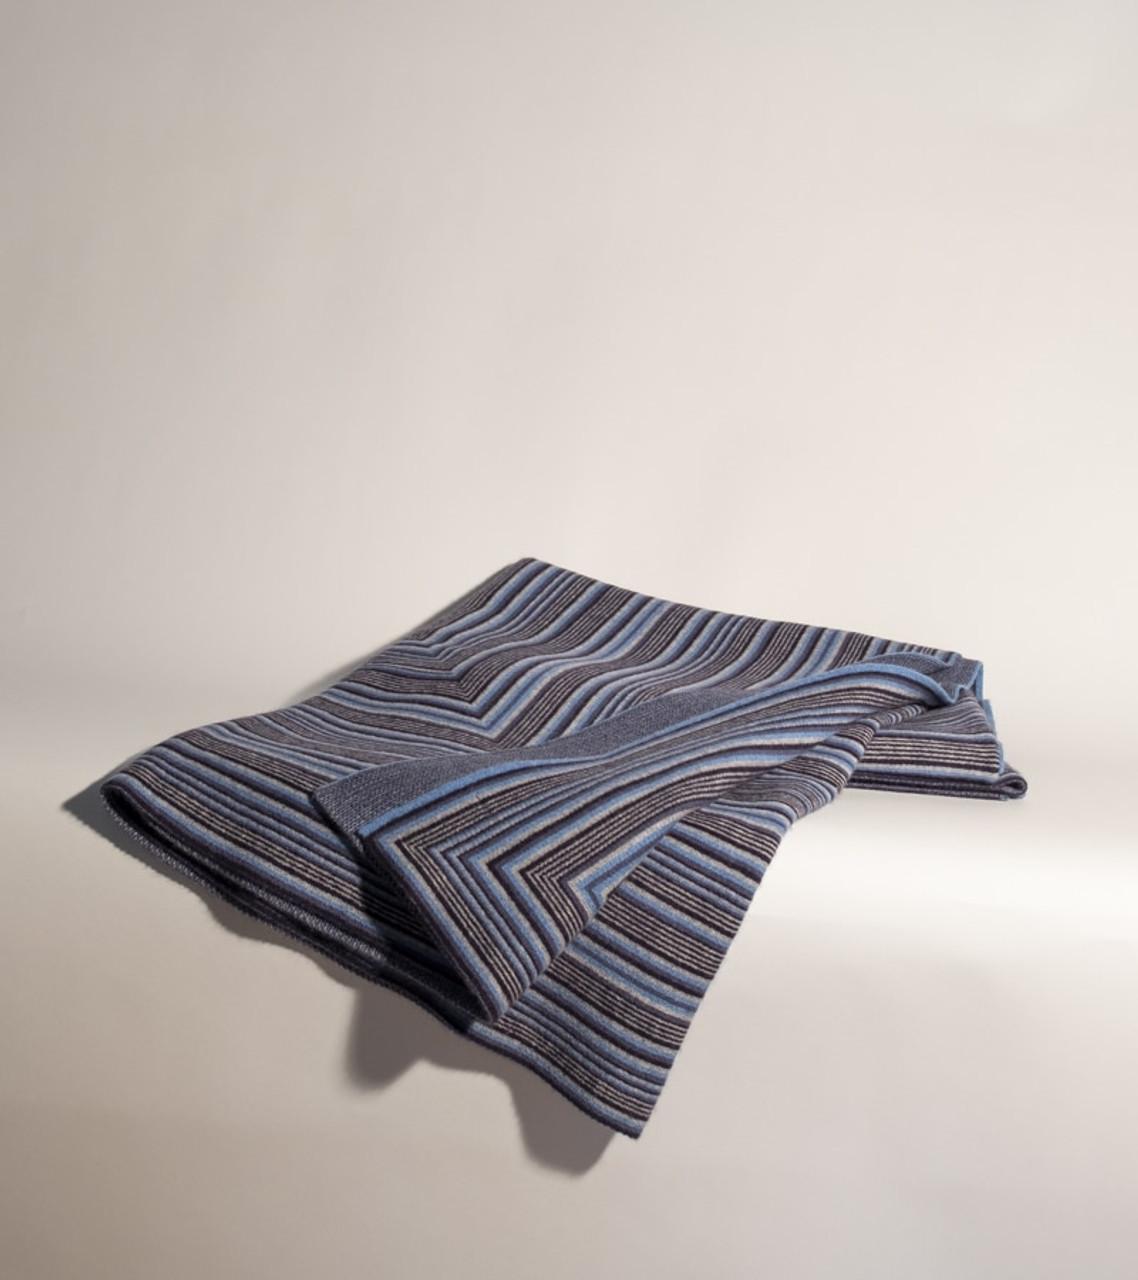 Jacquard Knit All Blue Throw